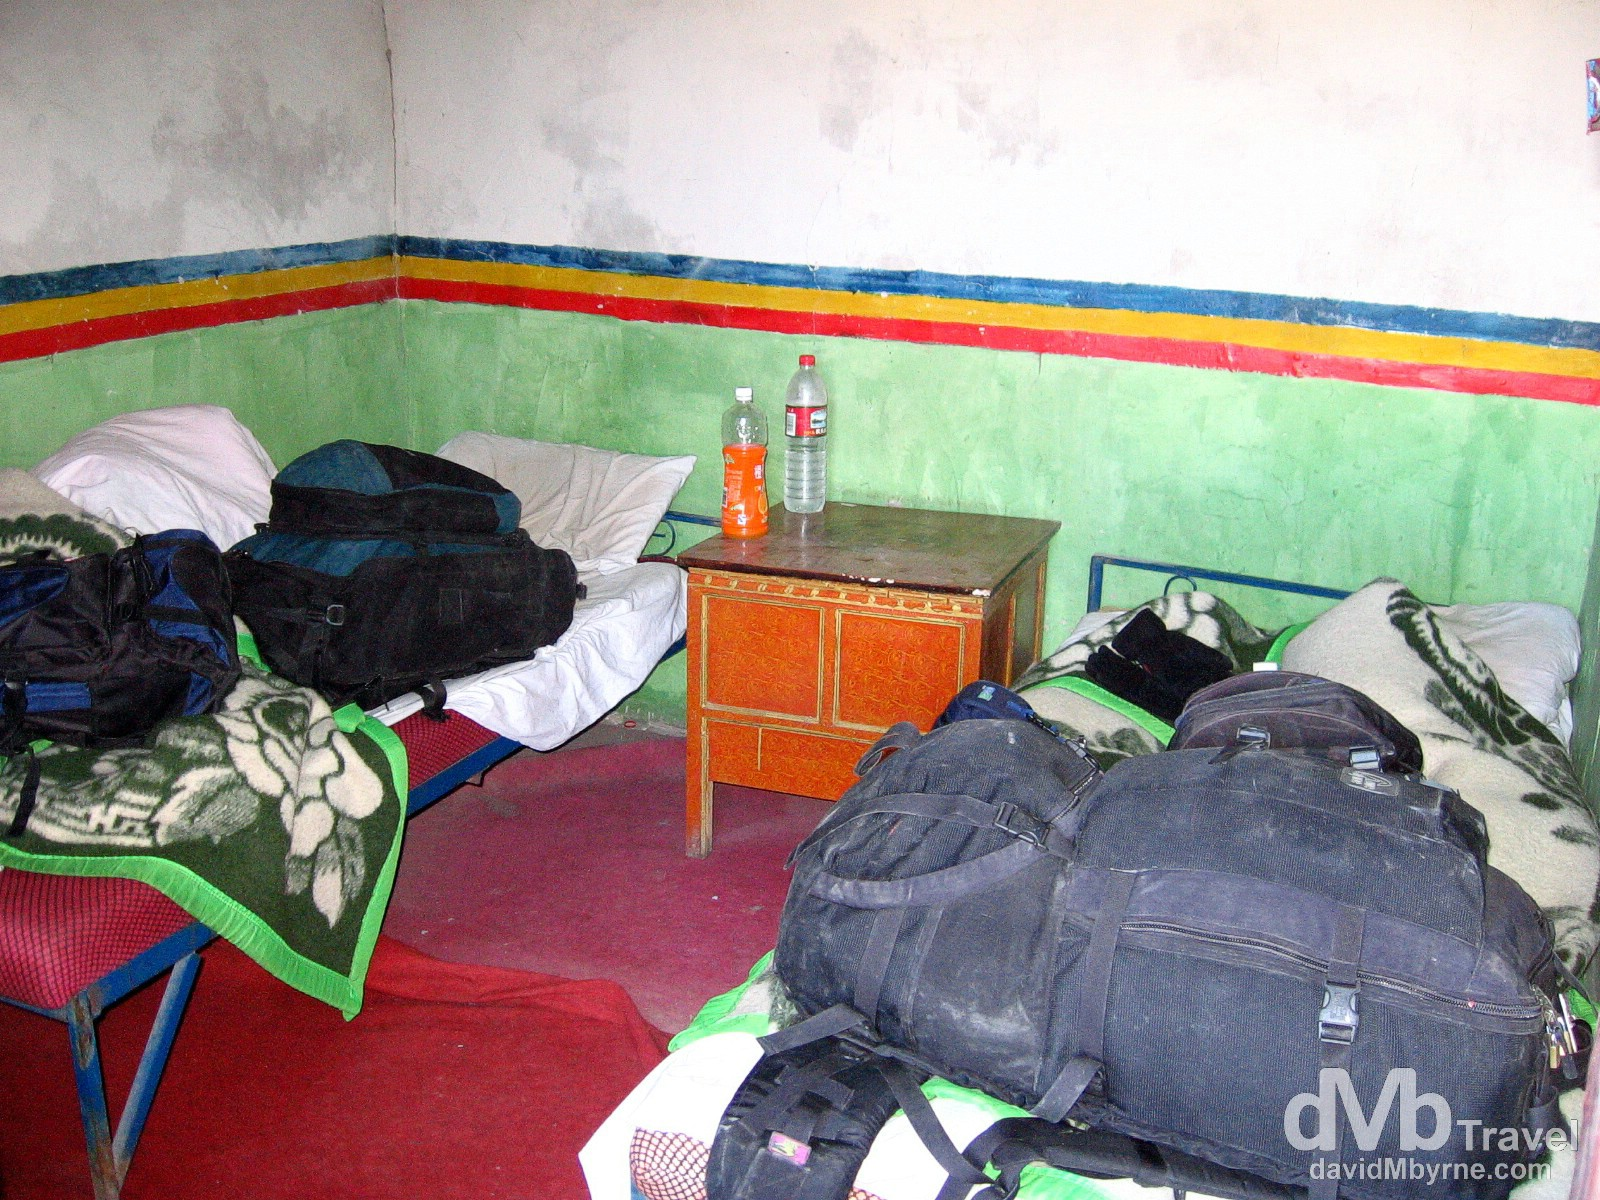 Amdo Hotel room, Tingri, Tibet. March 3rd, 2008.